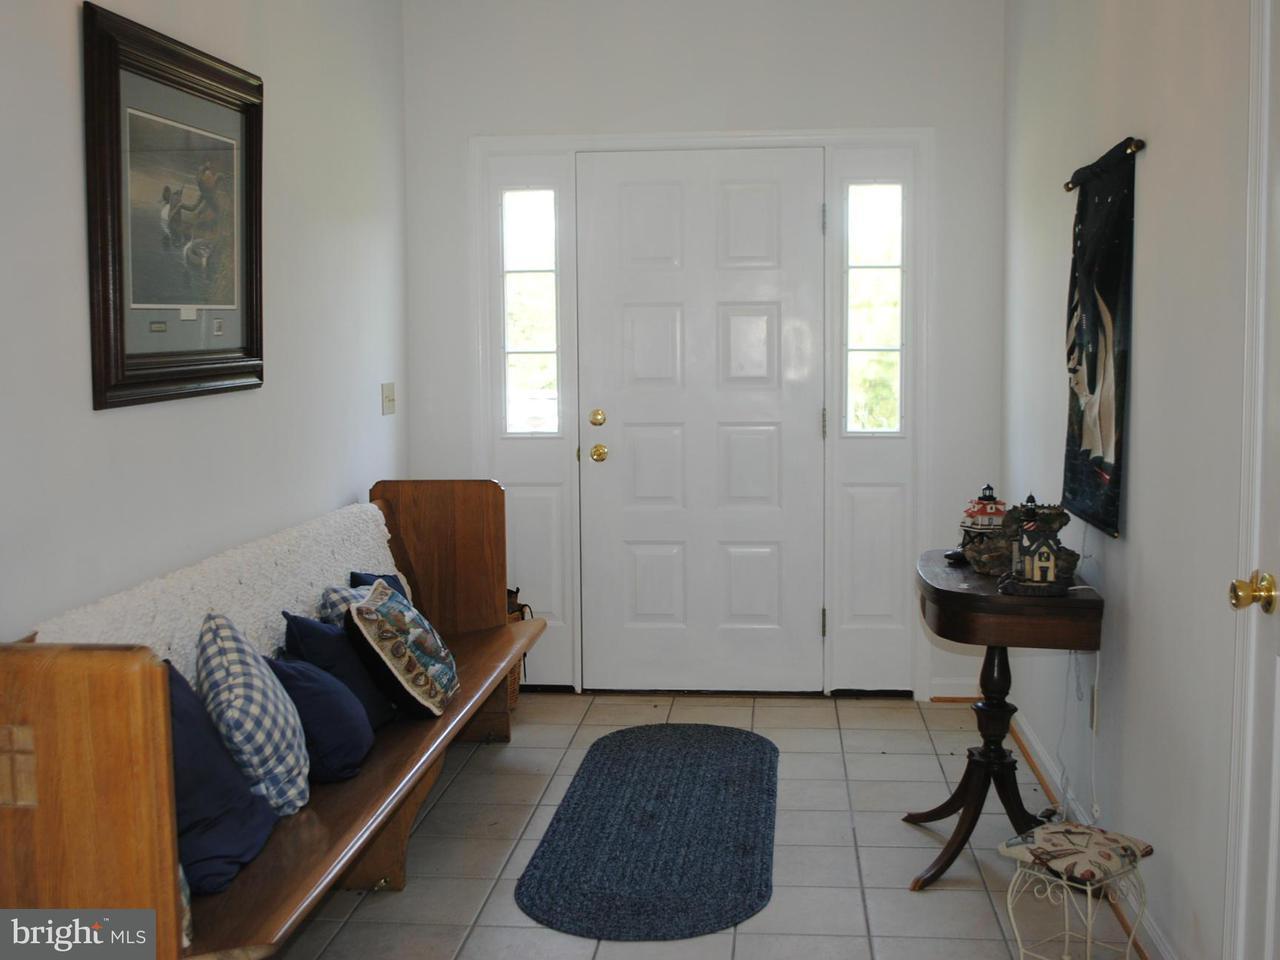 Additional photo for property listing at 5115 David Greene Rd  Cambridge, Maryland 21613 United States